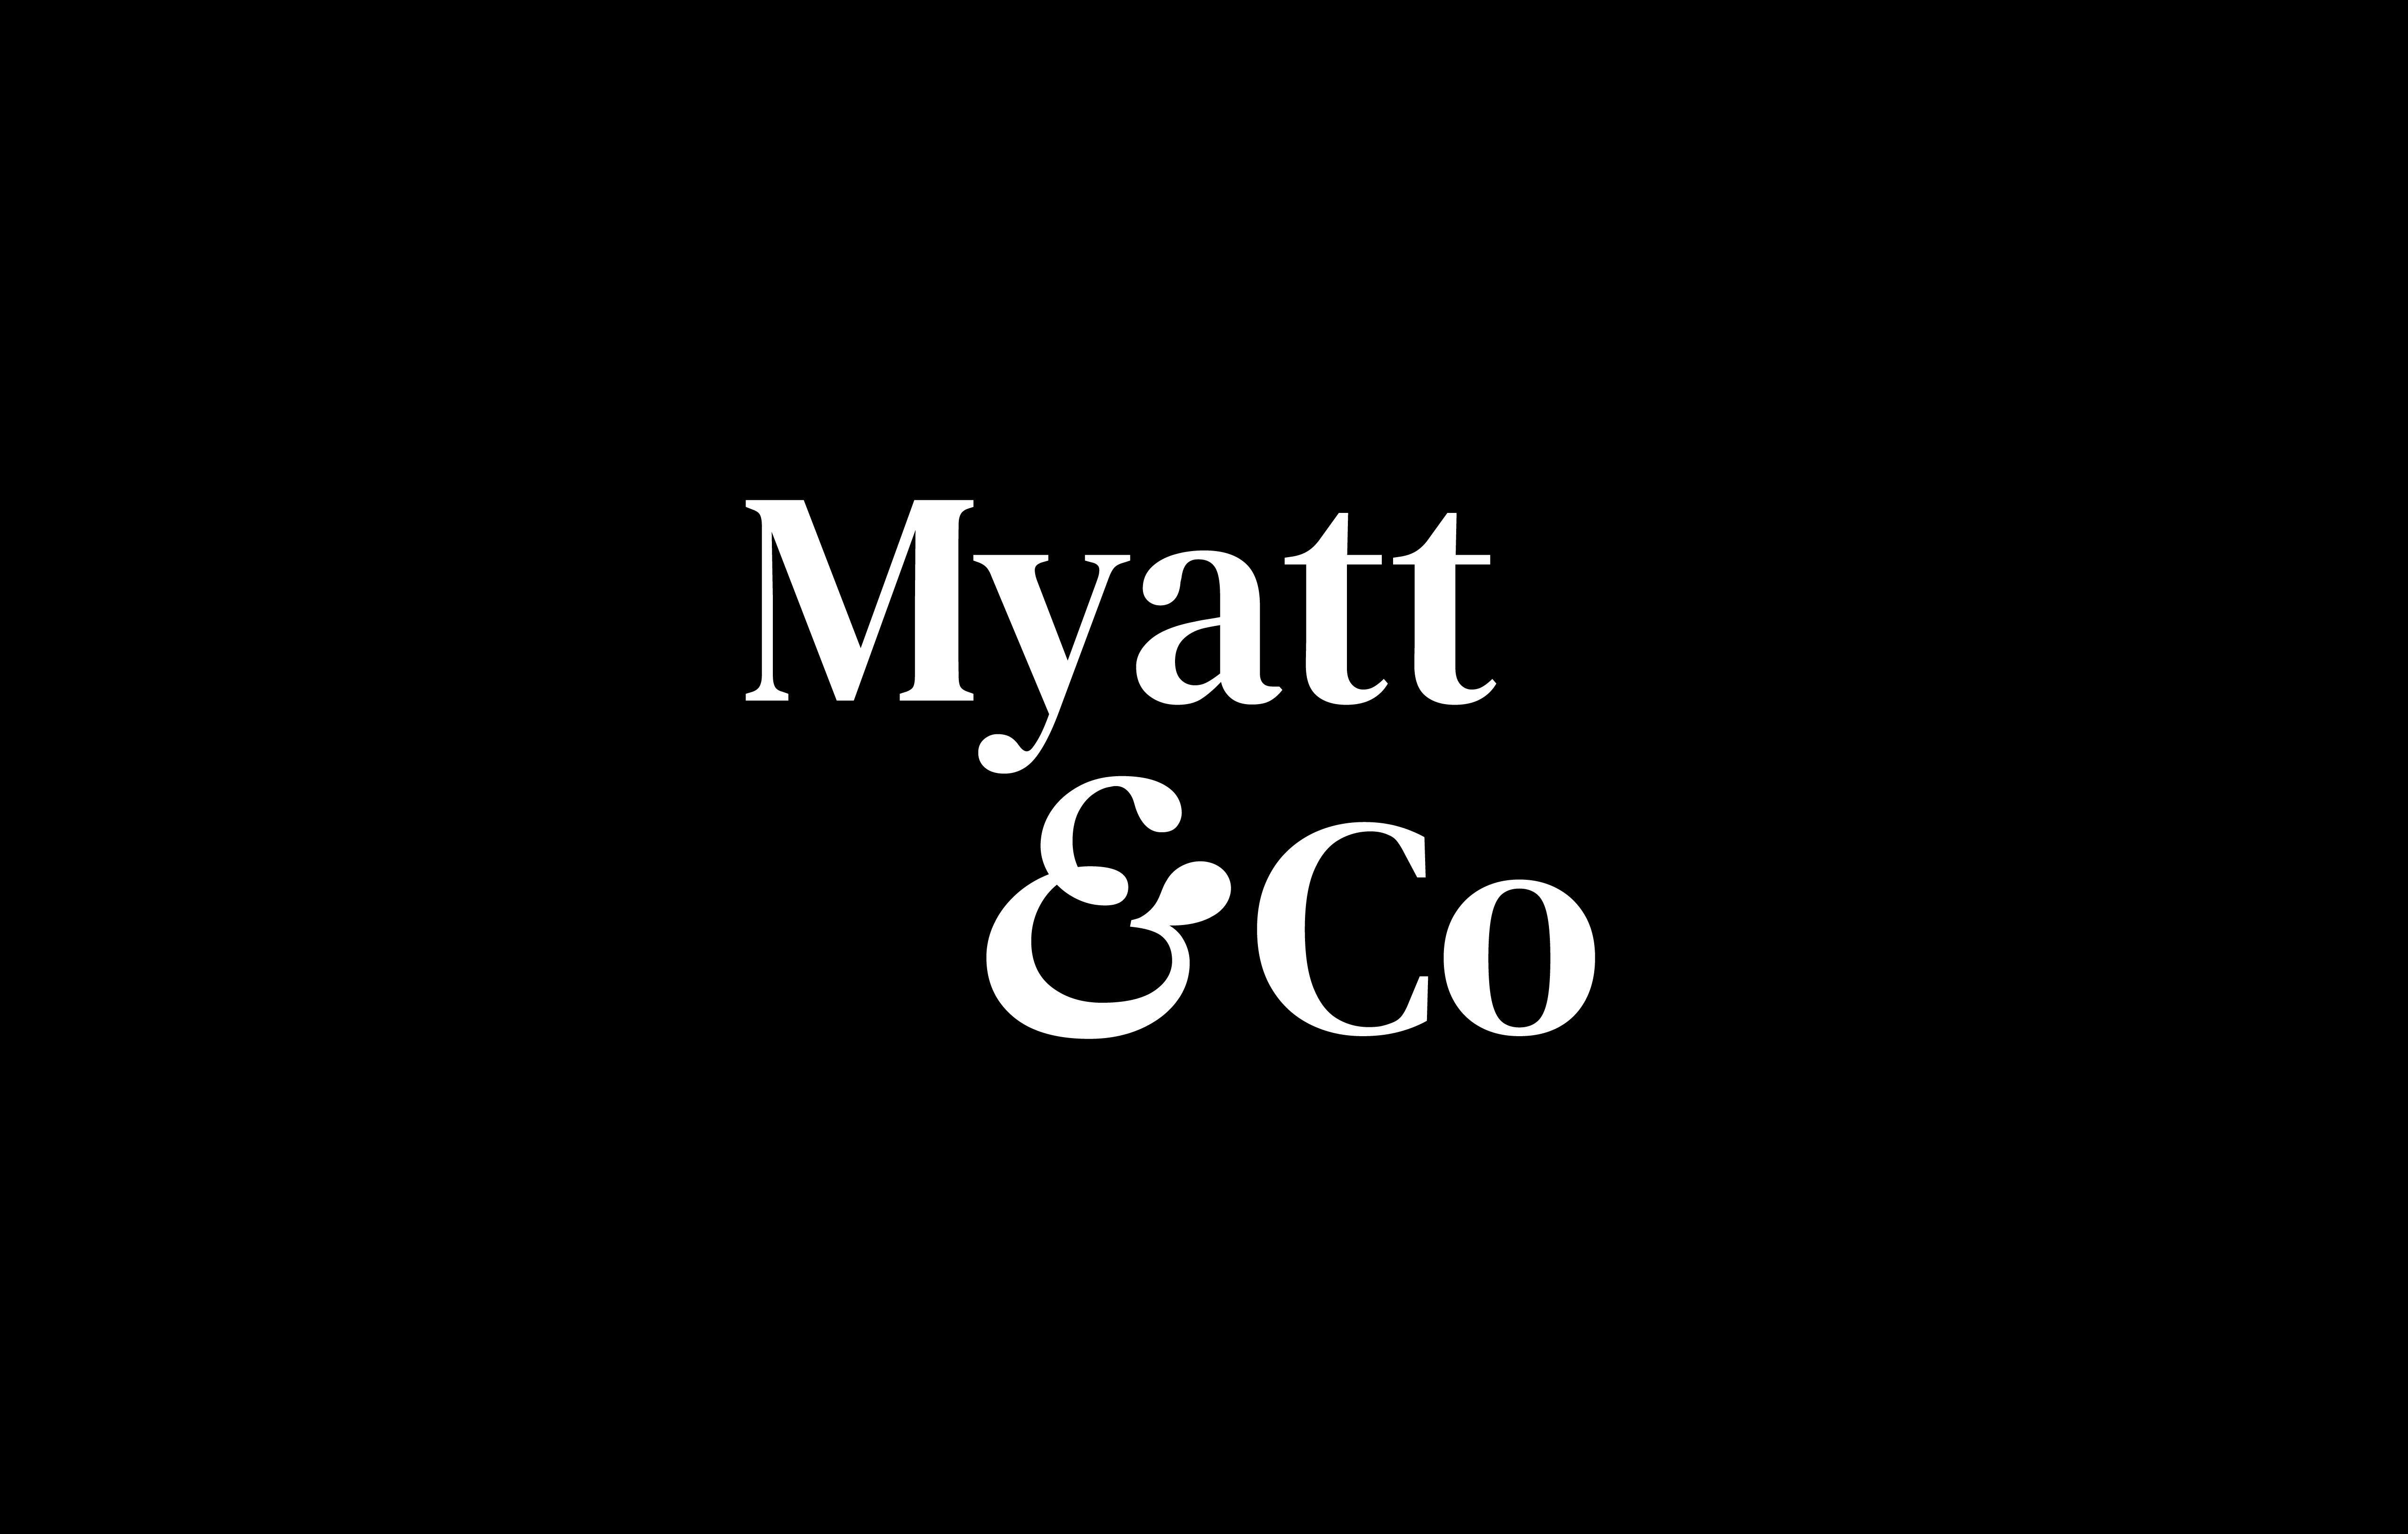 Myatt & Co